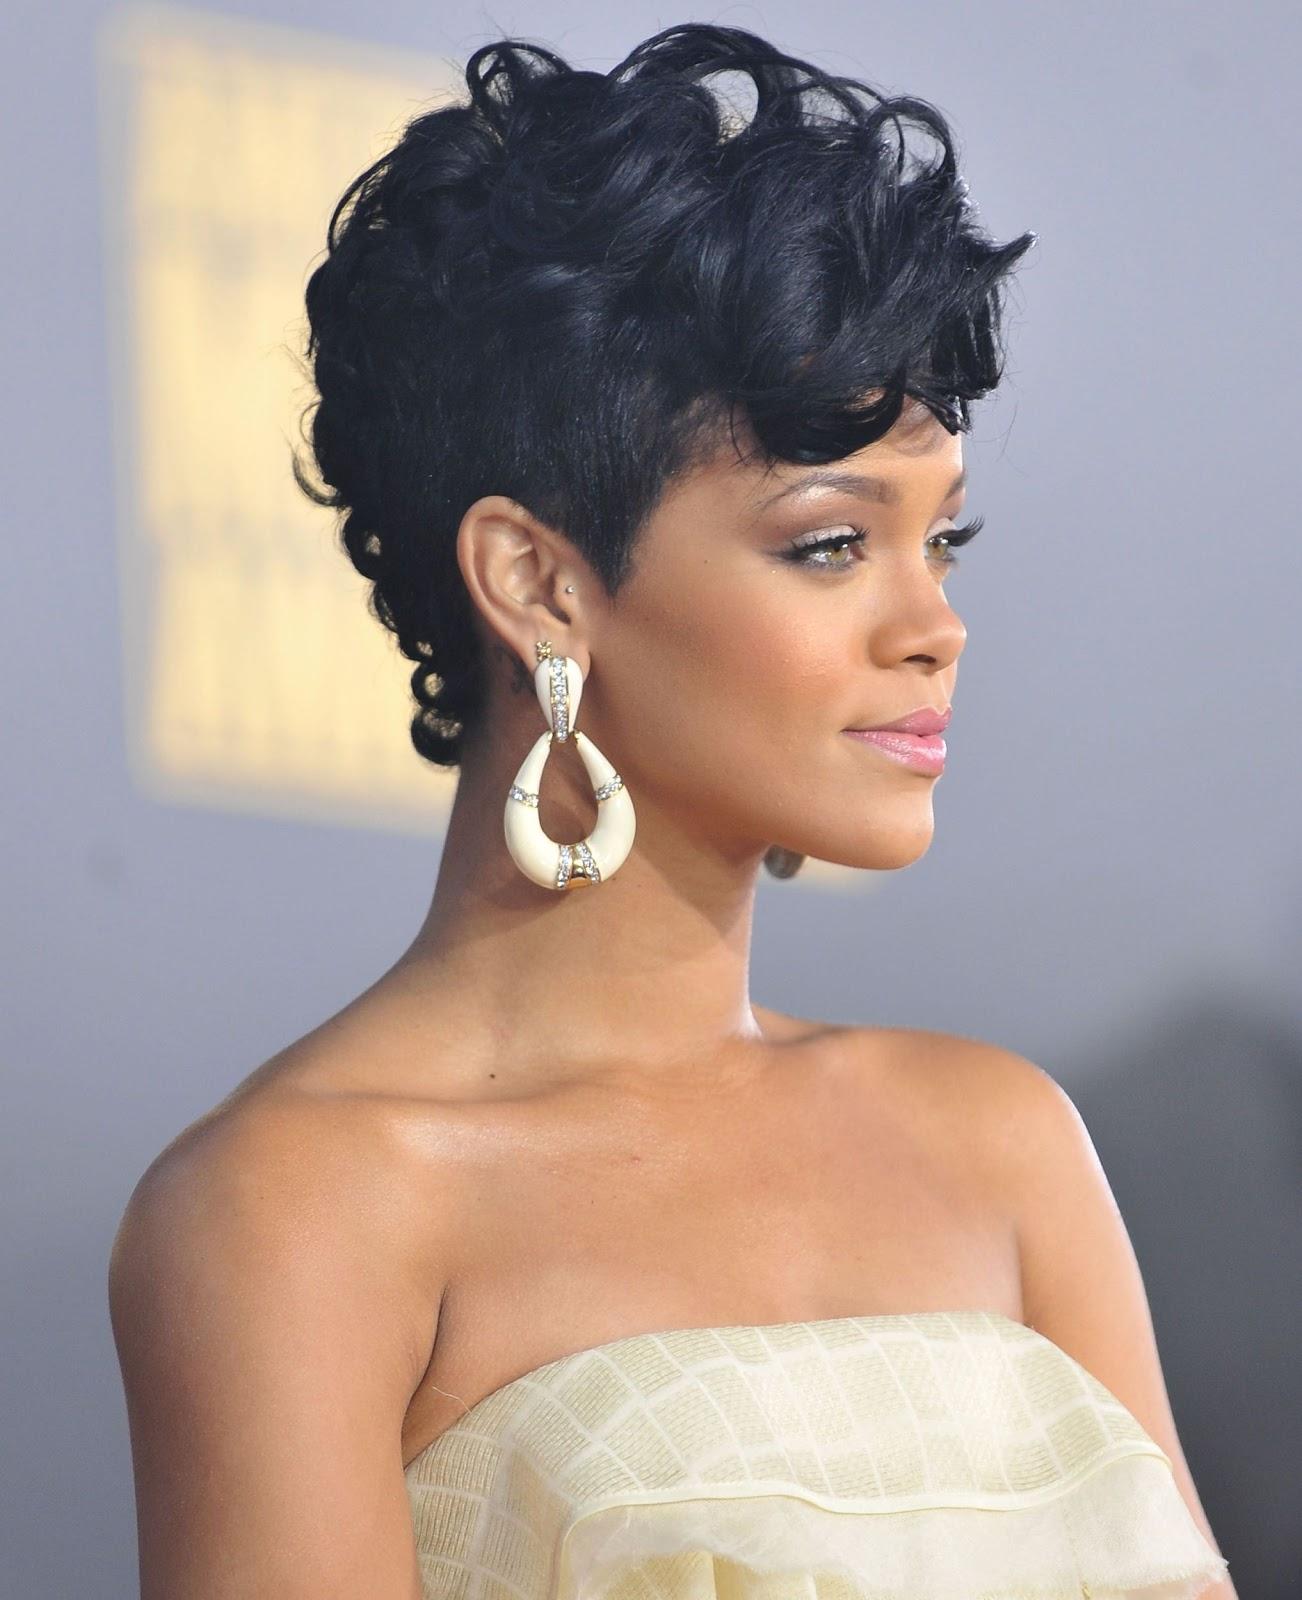 Dolce Vanity Rihanna Cut Favourite